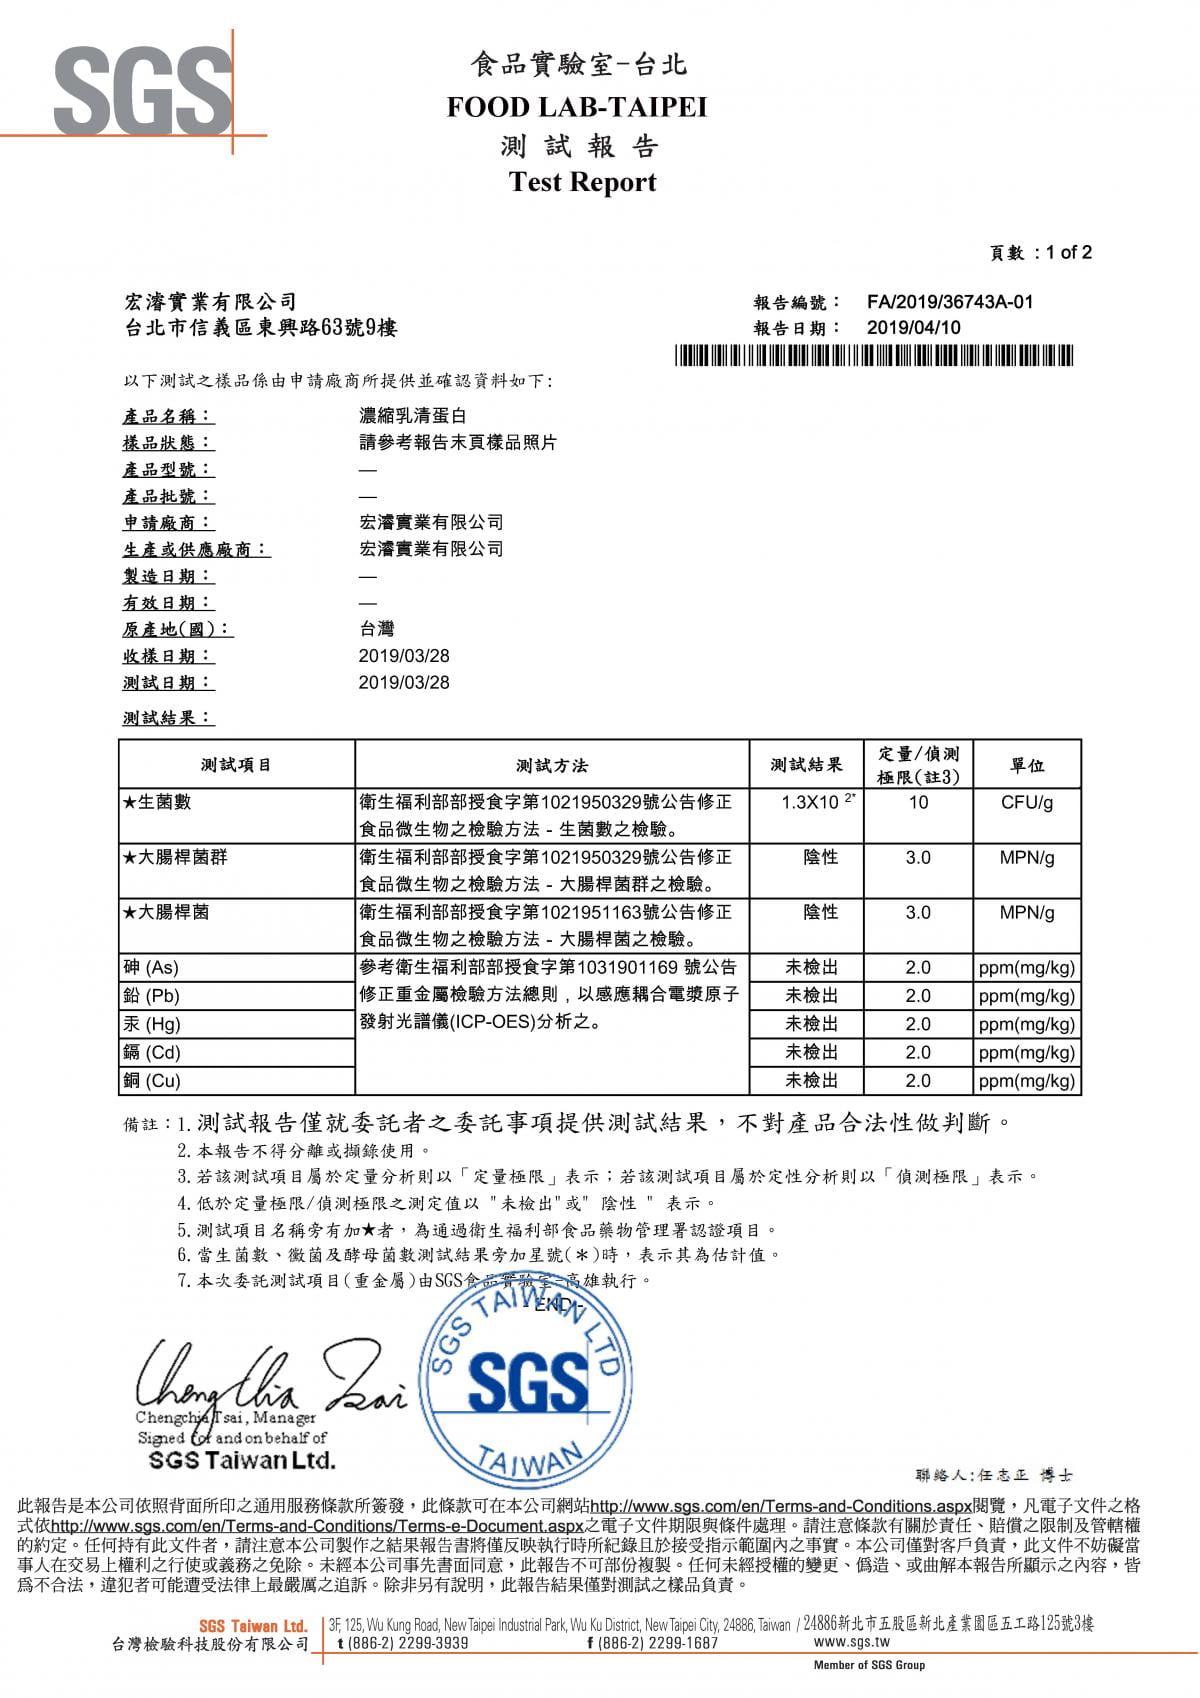 【Bioplus】濃縮乳清蛋白(原味)-60入健身盒 高蛋白 低脂 WPC 7